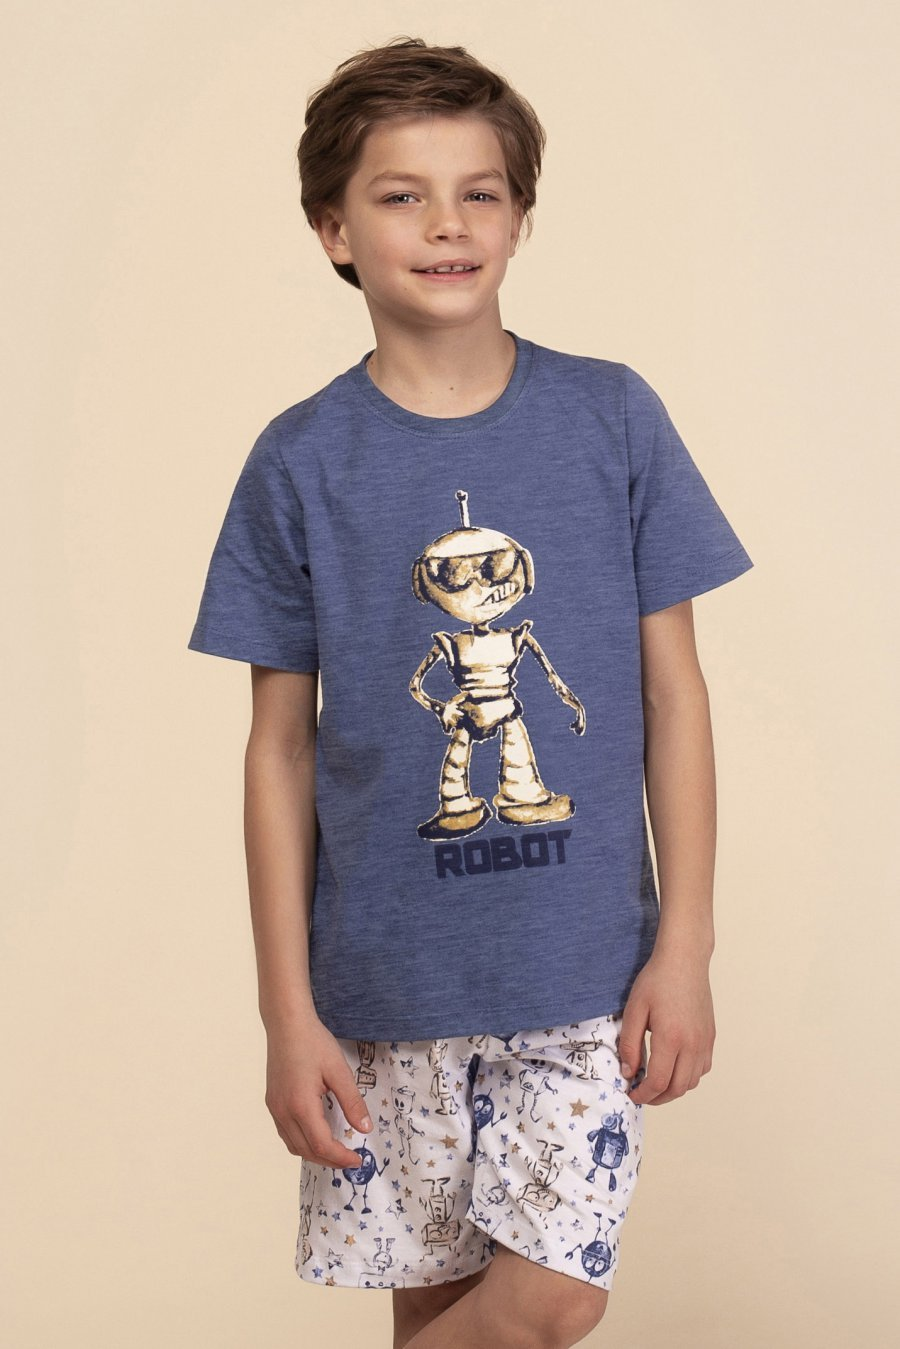 Pijama Infantil 1/2 Malha Robot Happy Moments Verão 2021